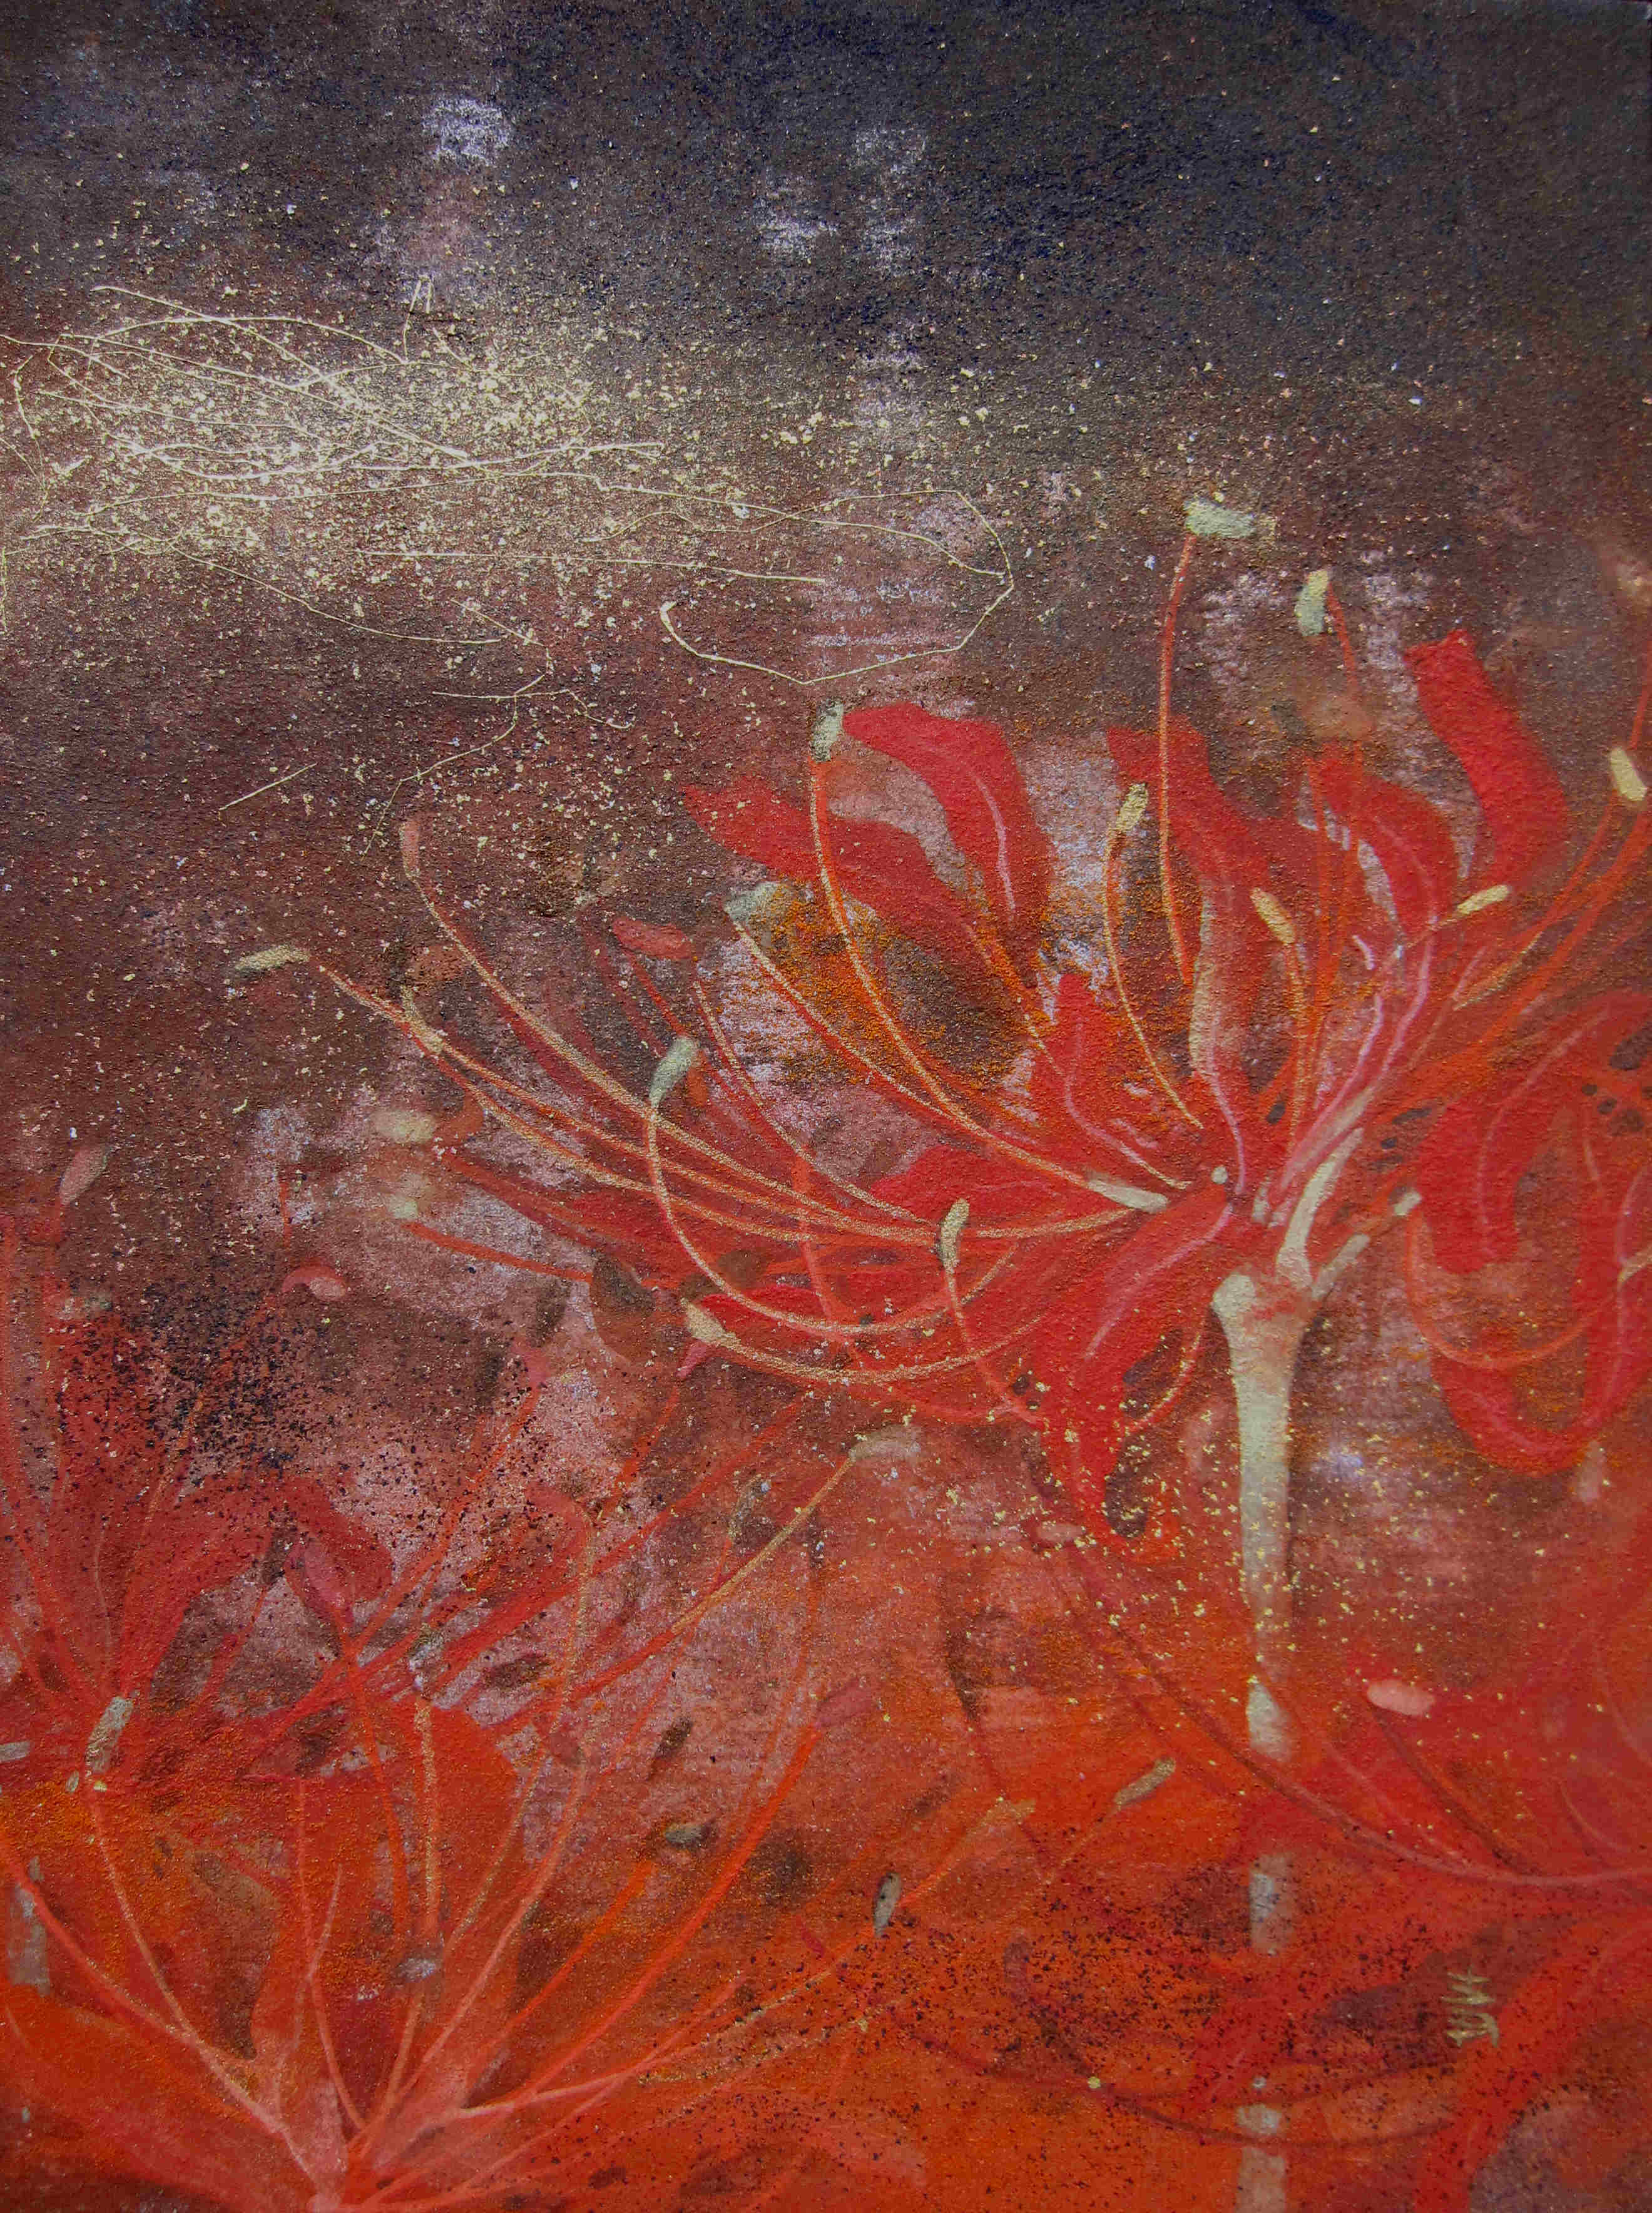 Flamme- 24x18cm /2013